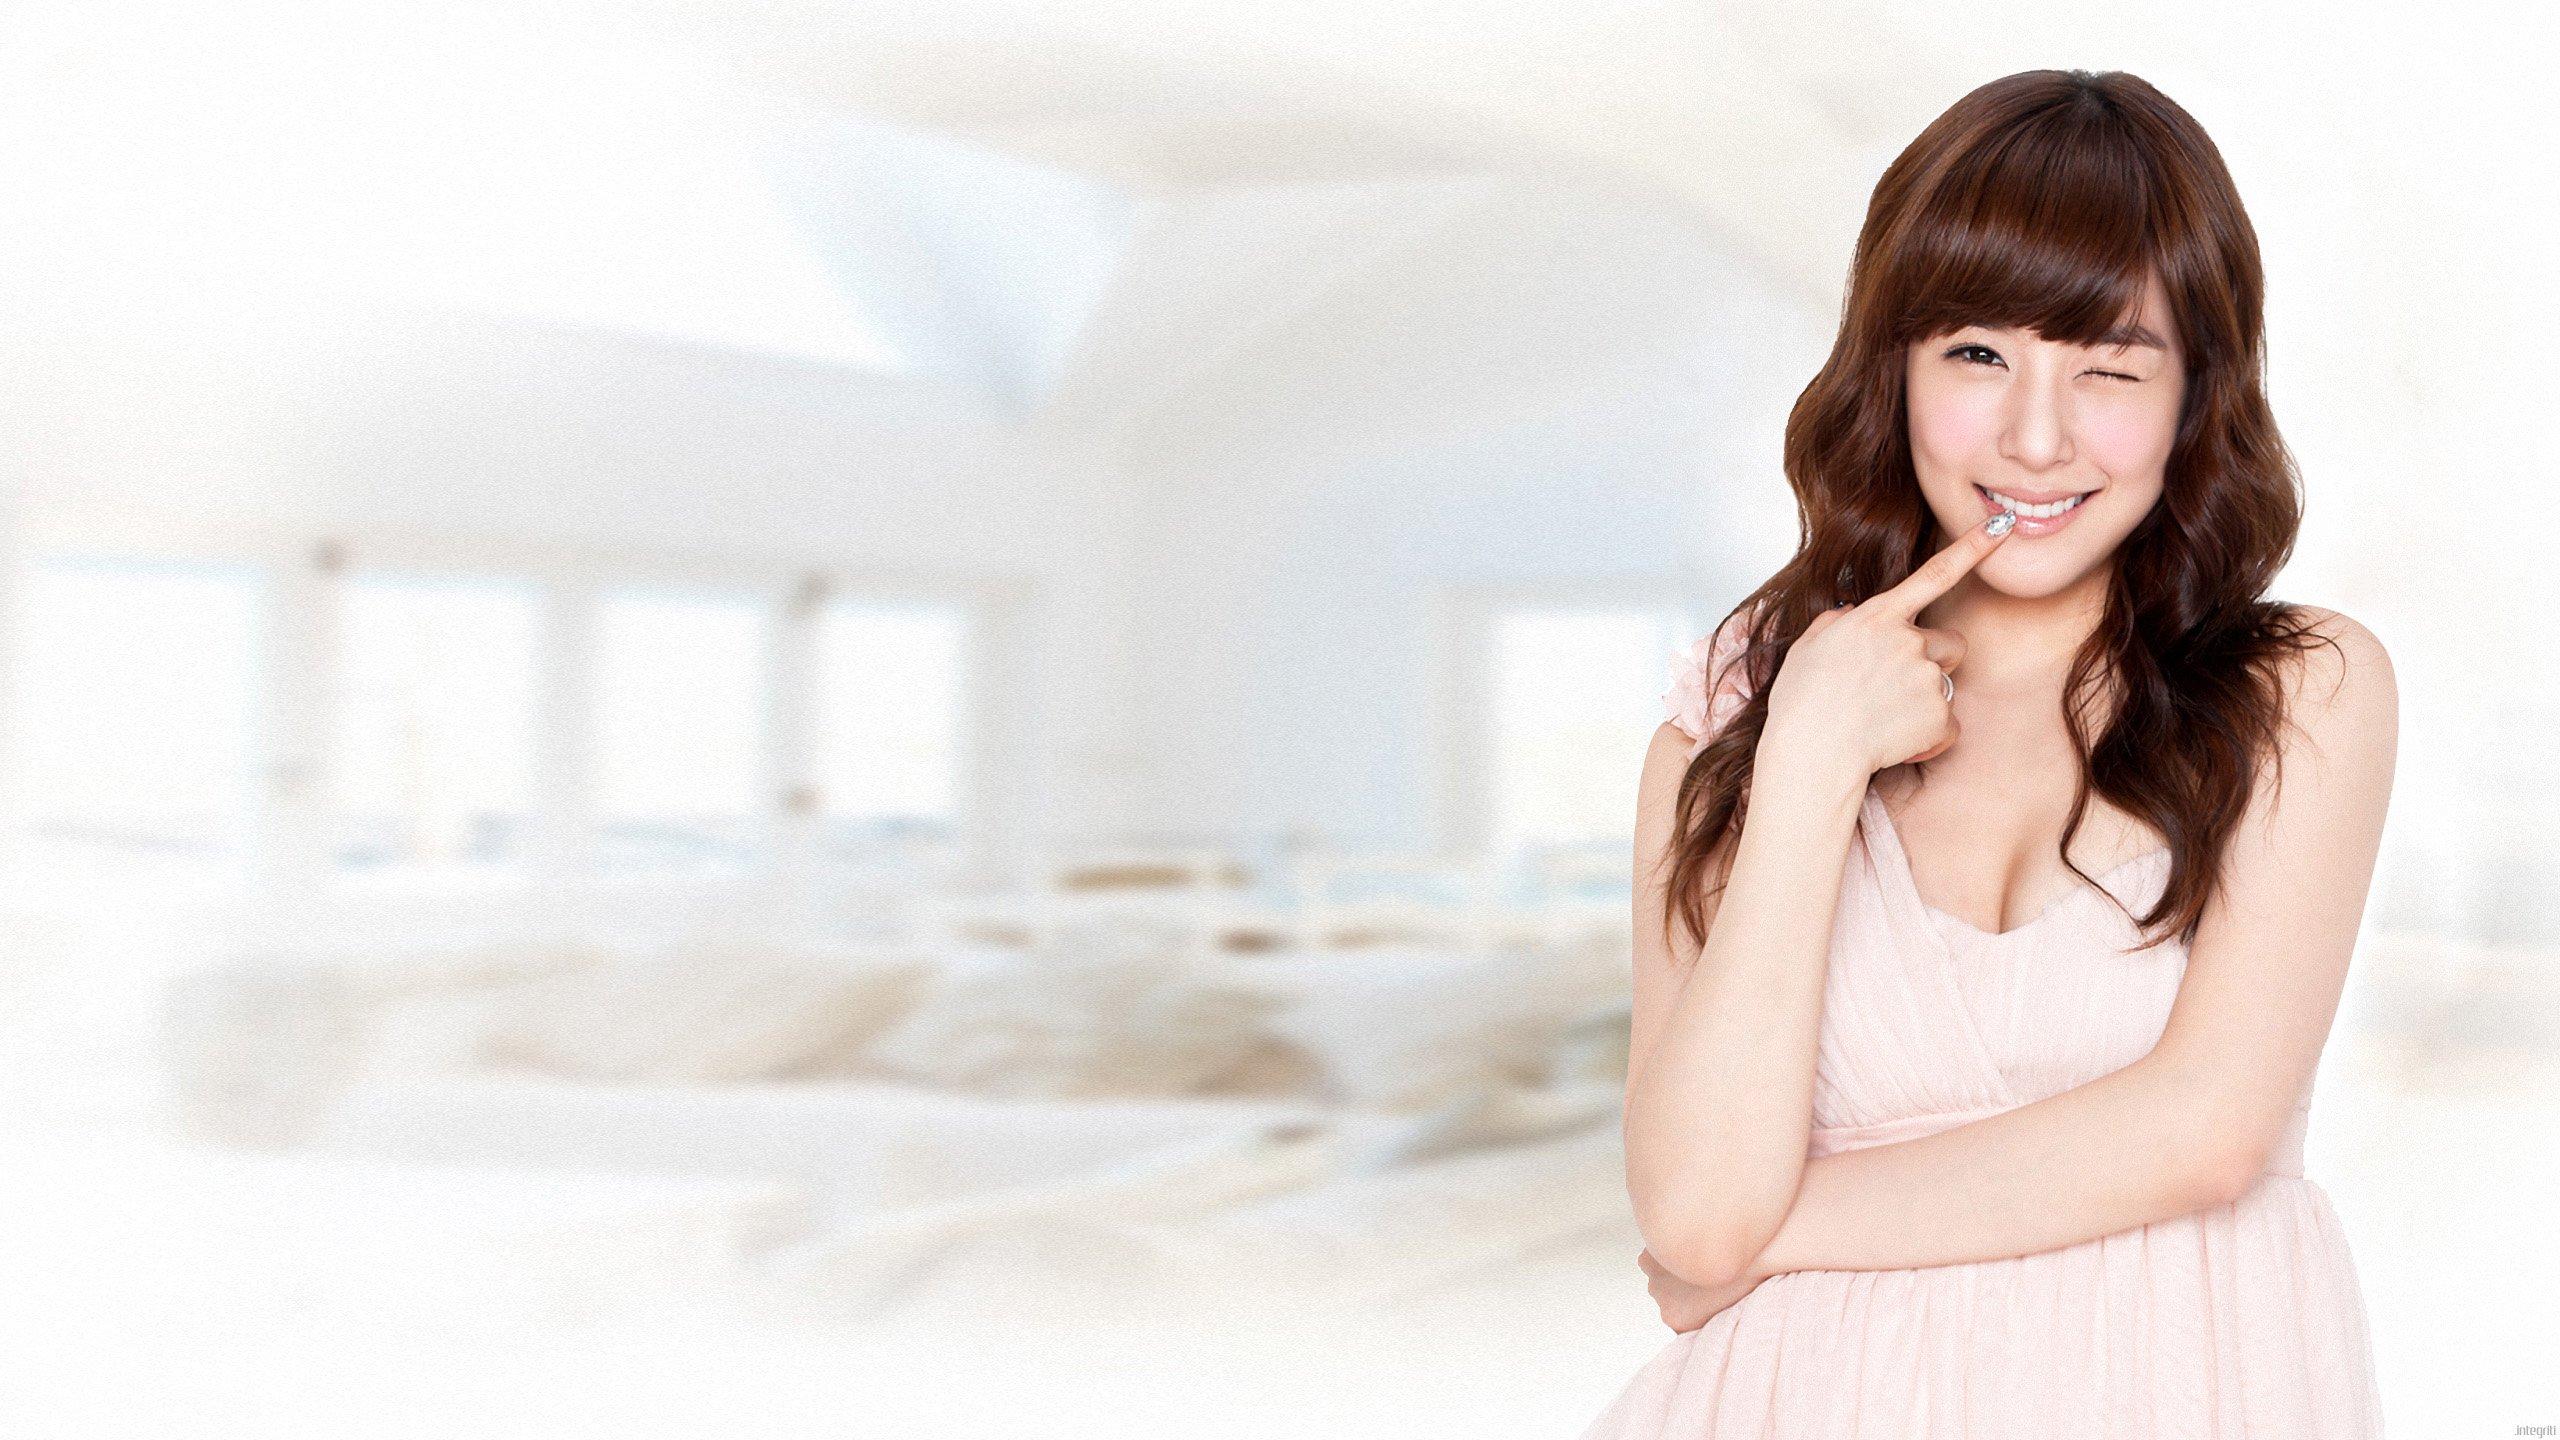 Snsd Tiffany Wallpaper - GzsiHai.com